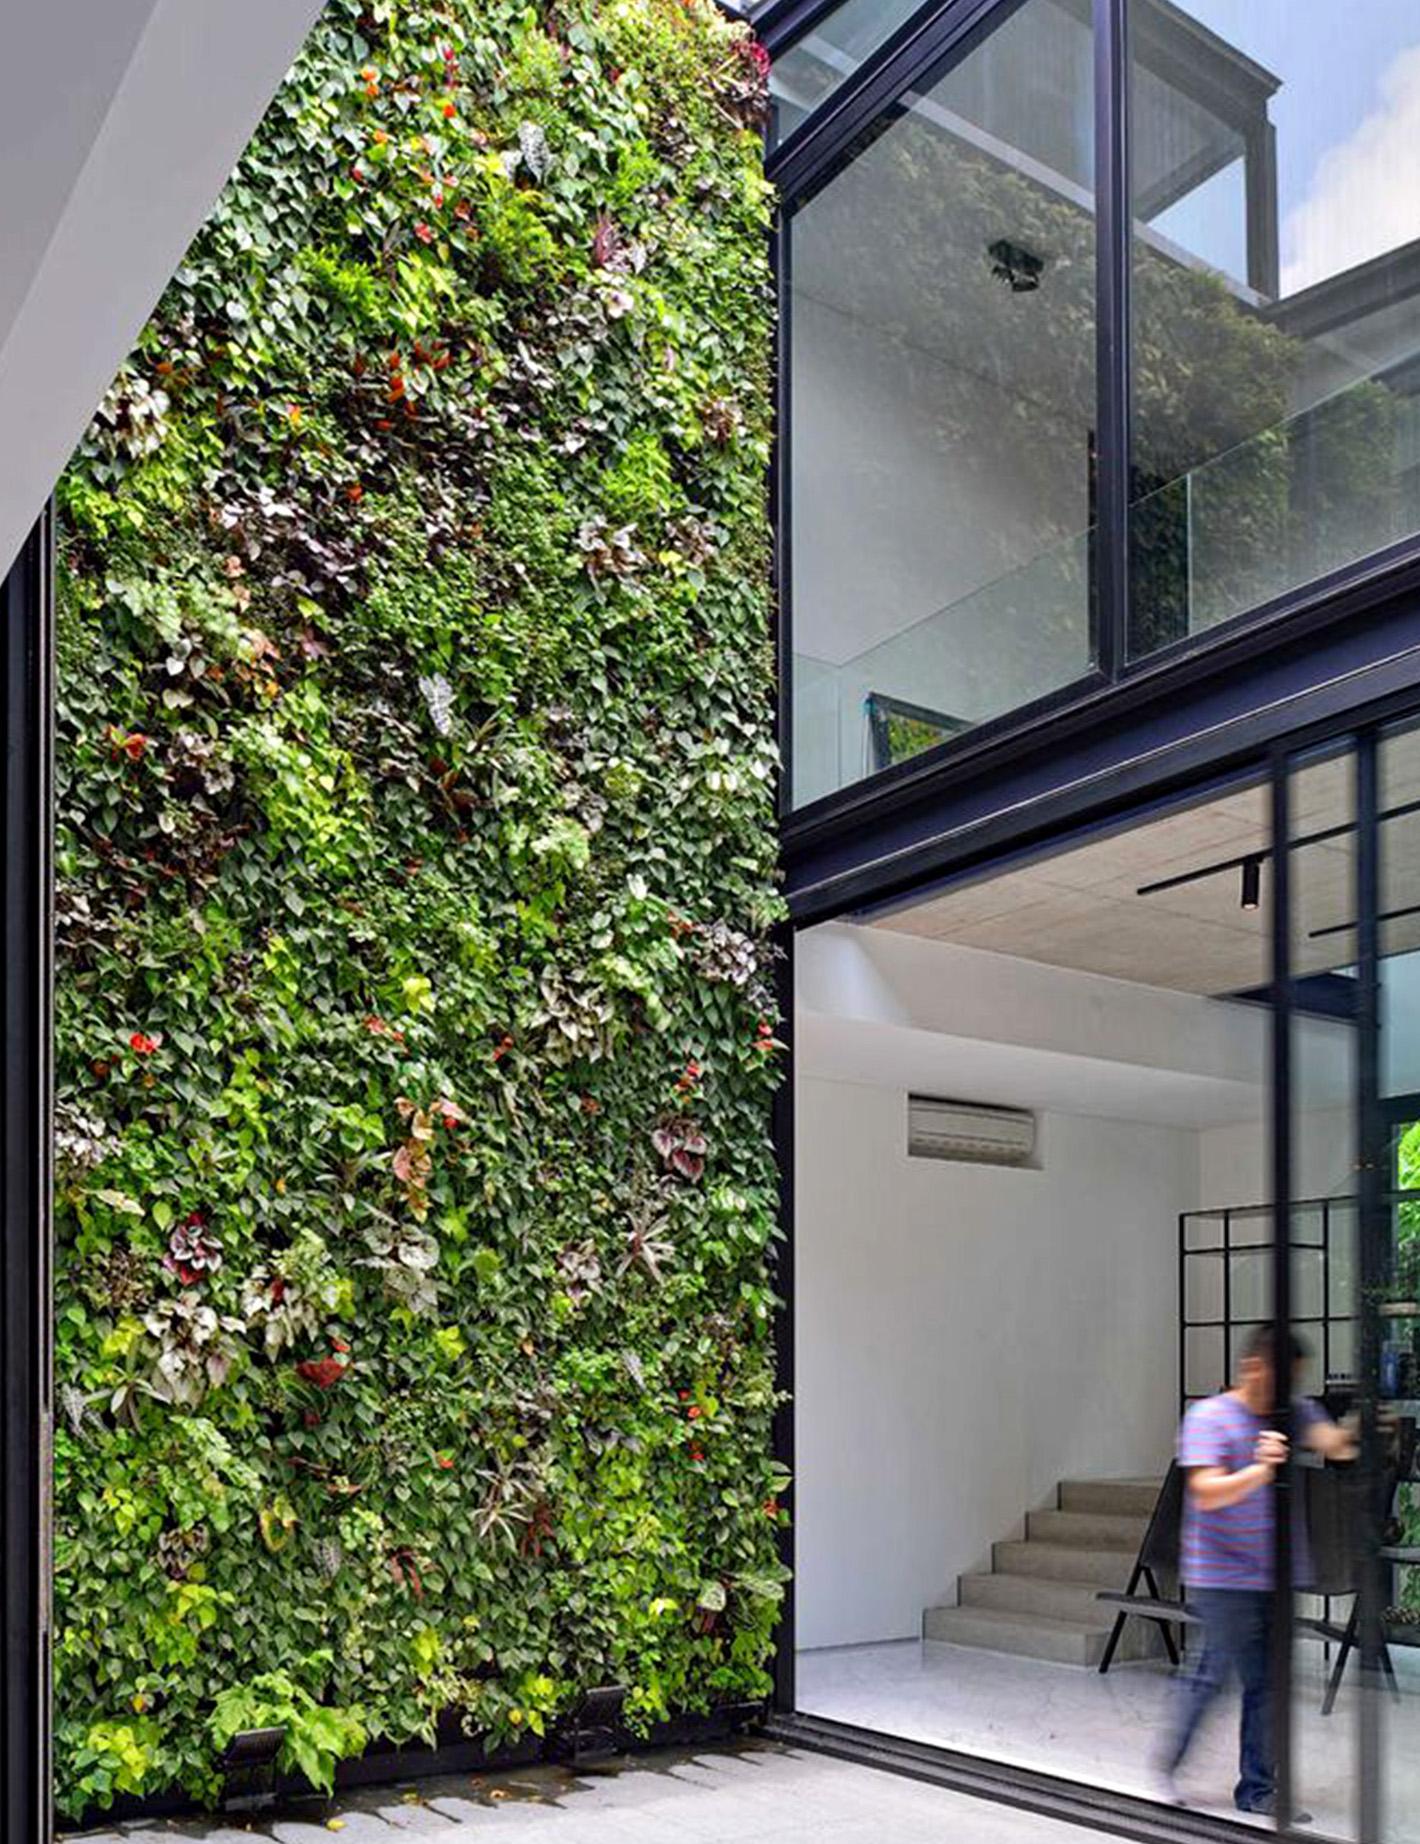 casas autosuficientes, jardín vertical